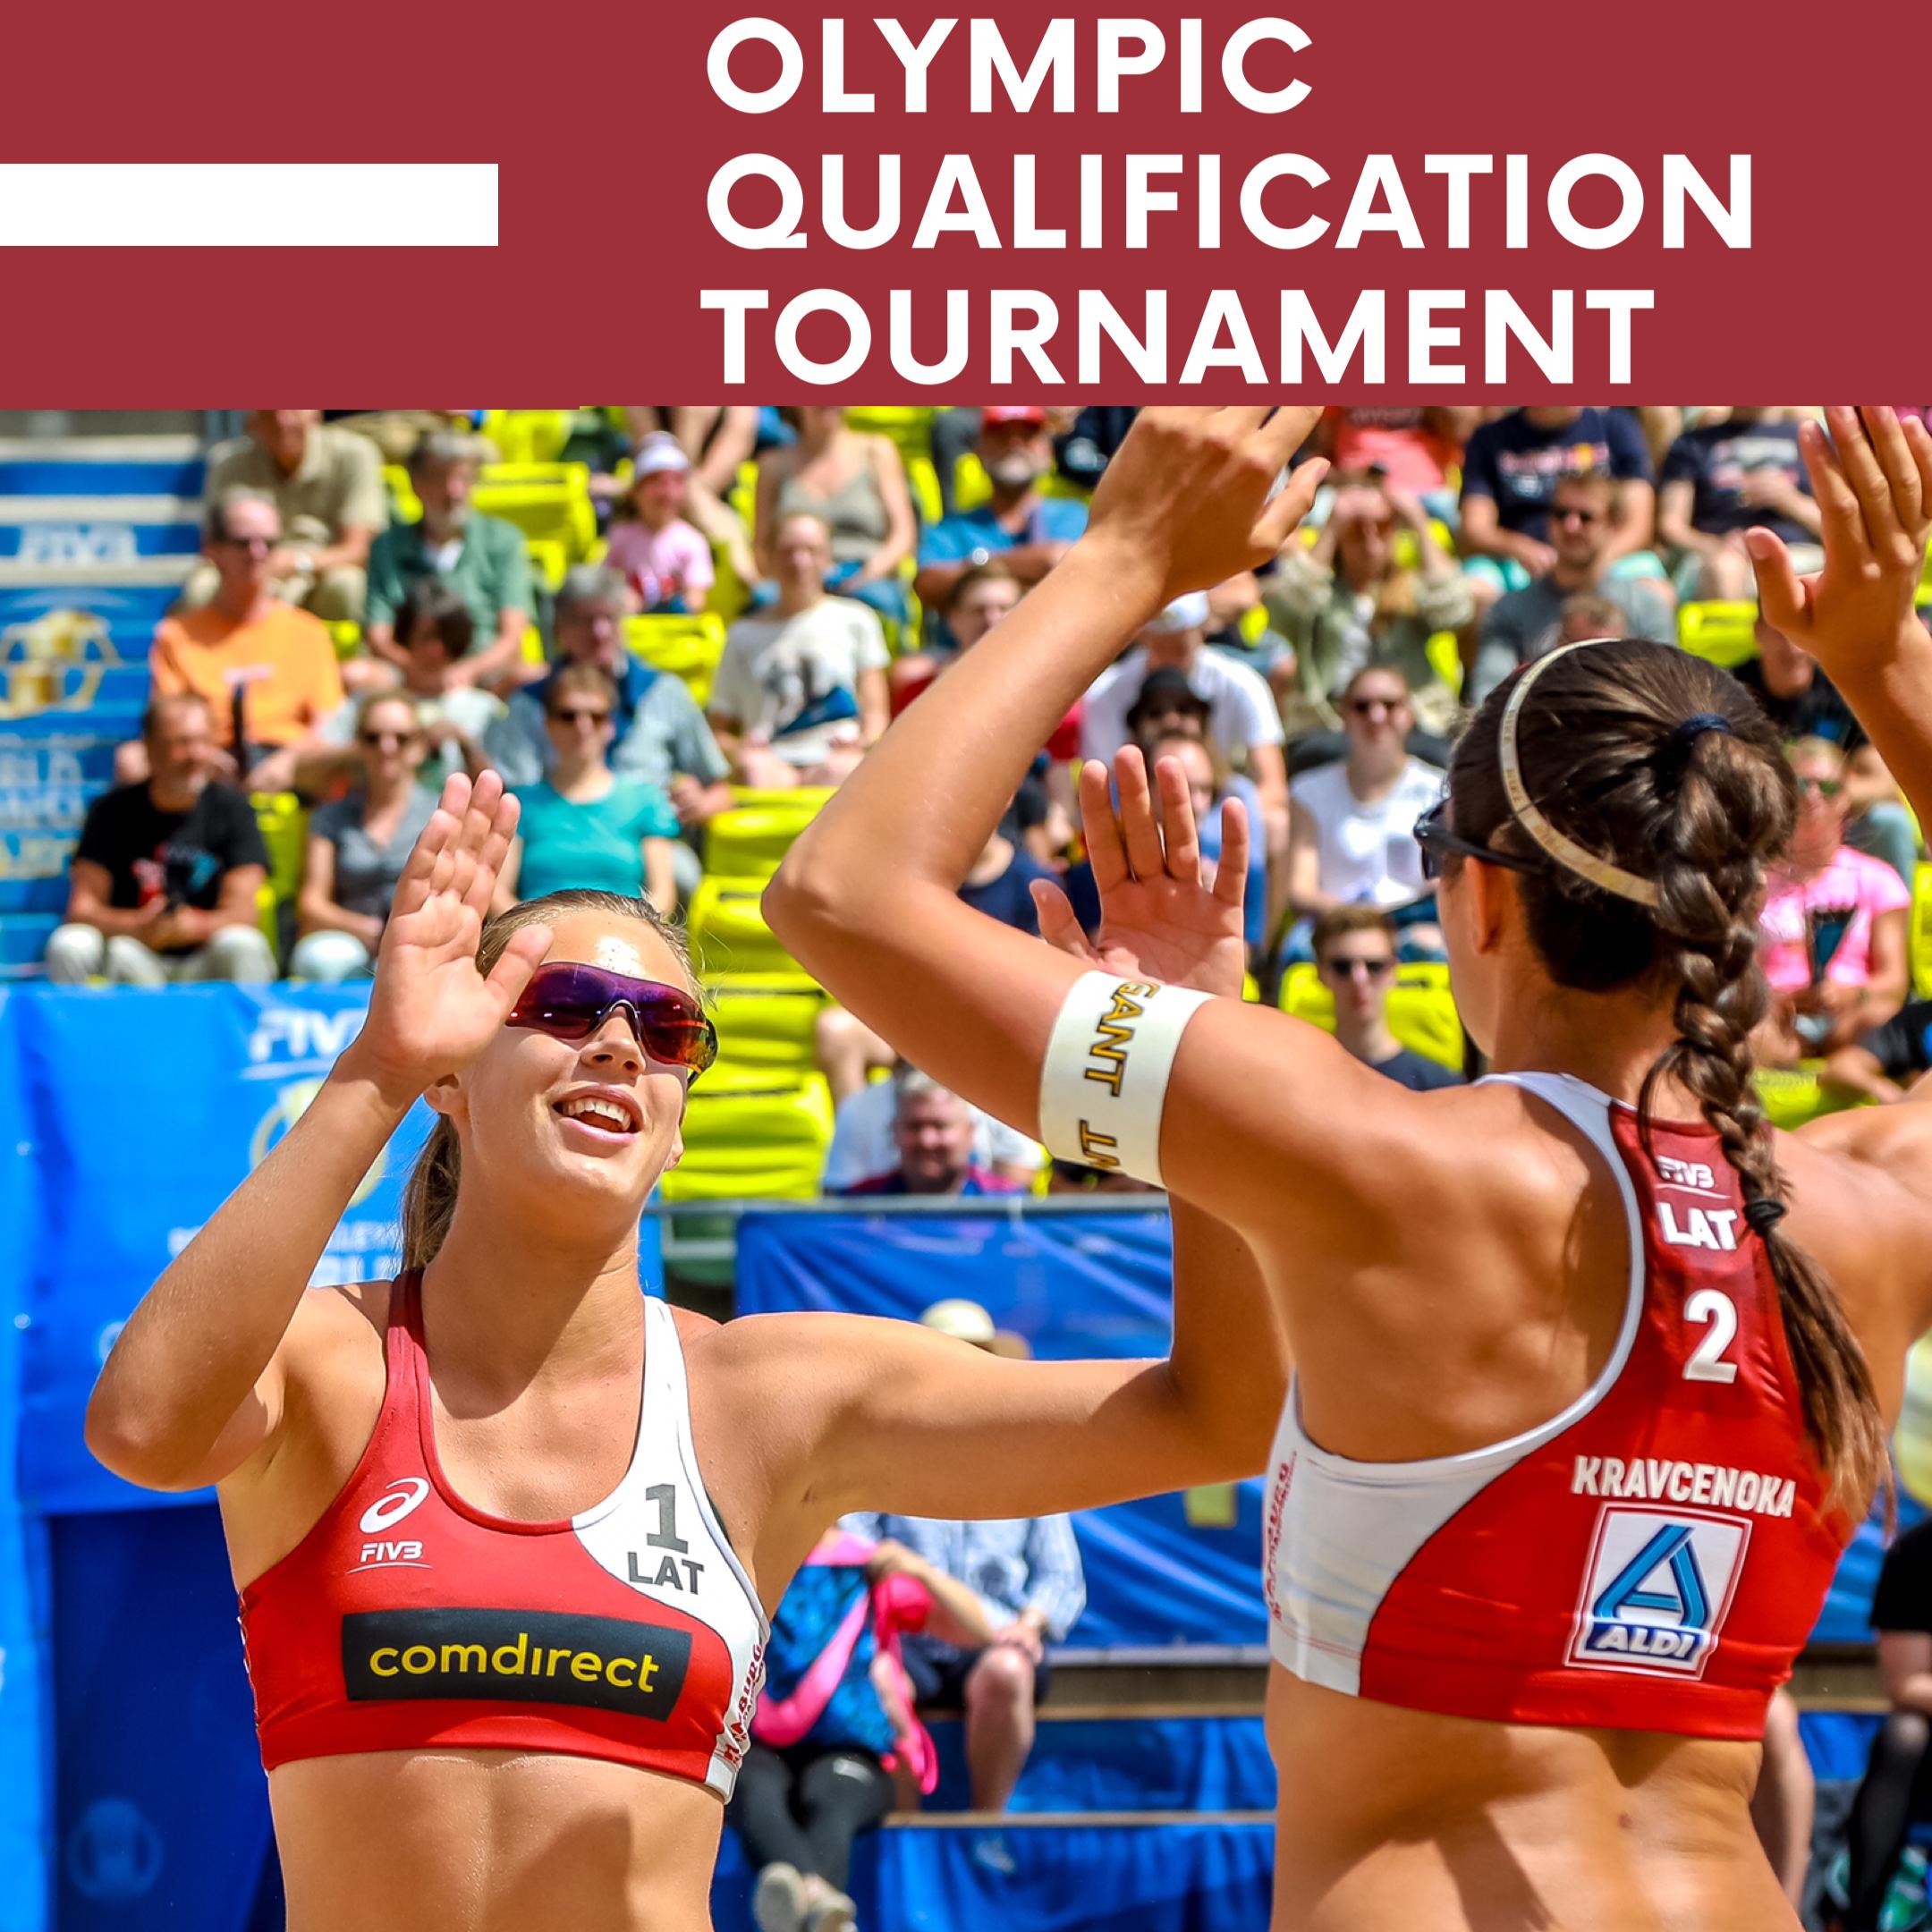 Beachvolleyball Olympia Qualifikation